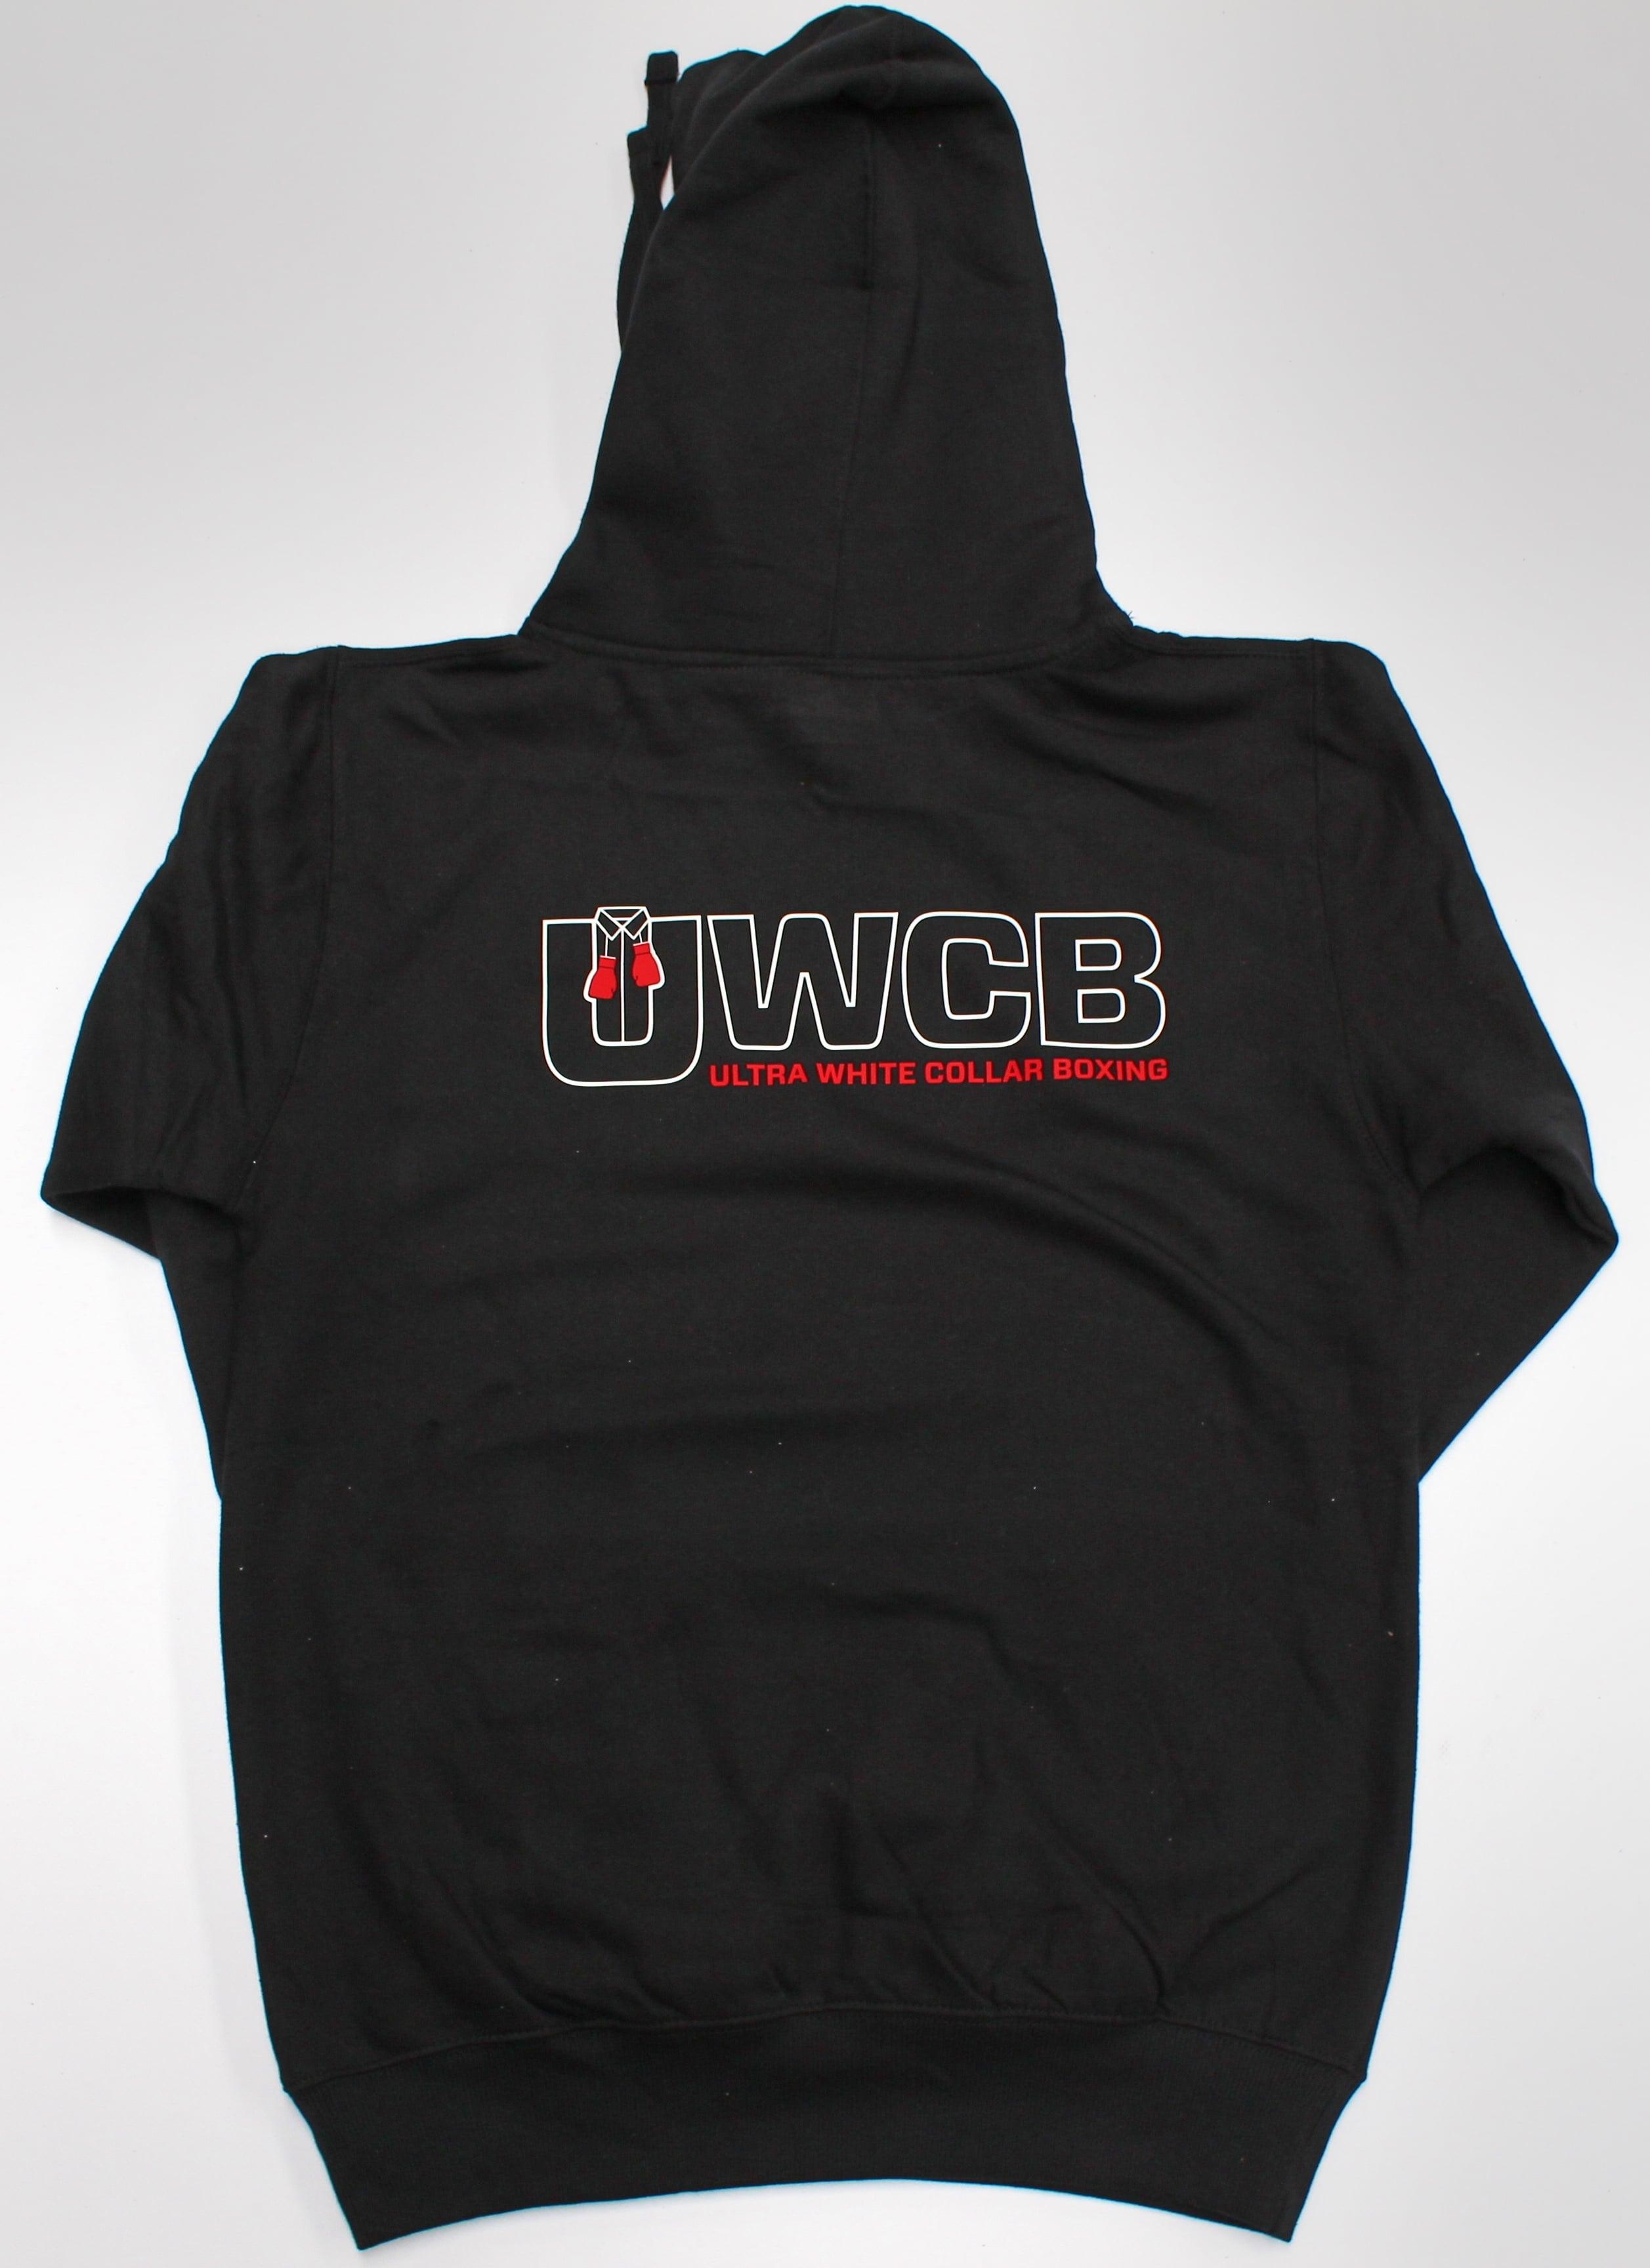 Ultra White Collar Boxing(UWCB) Hoodie - Back